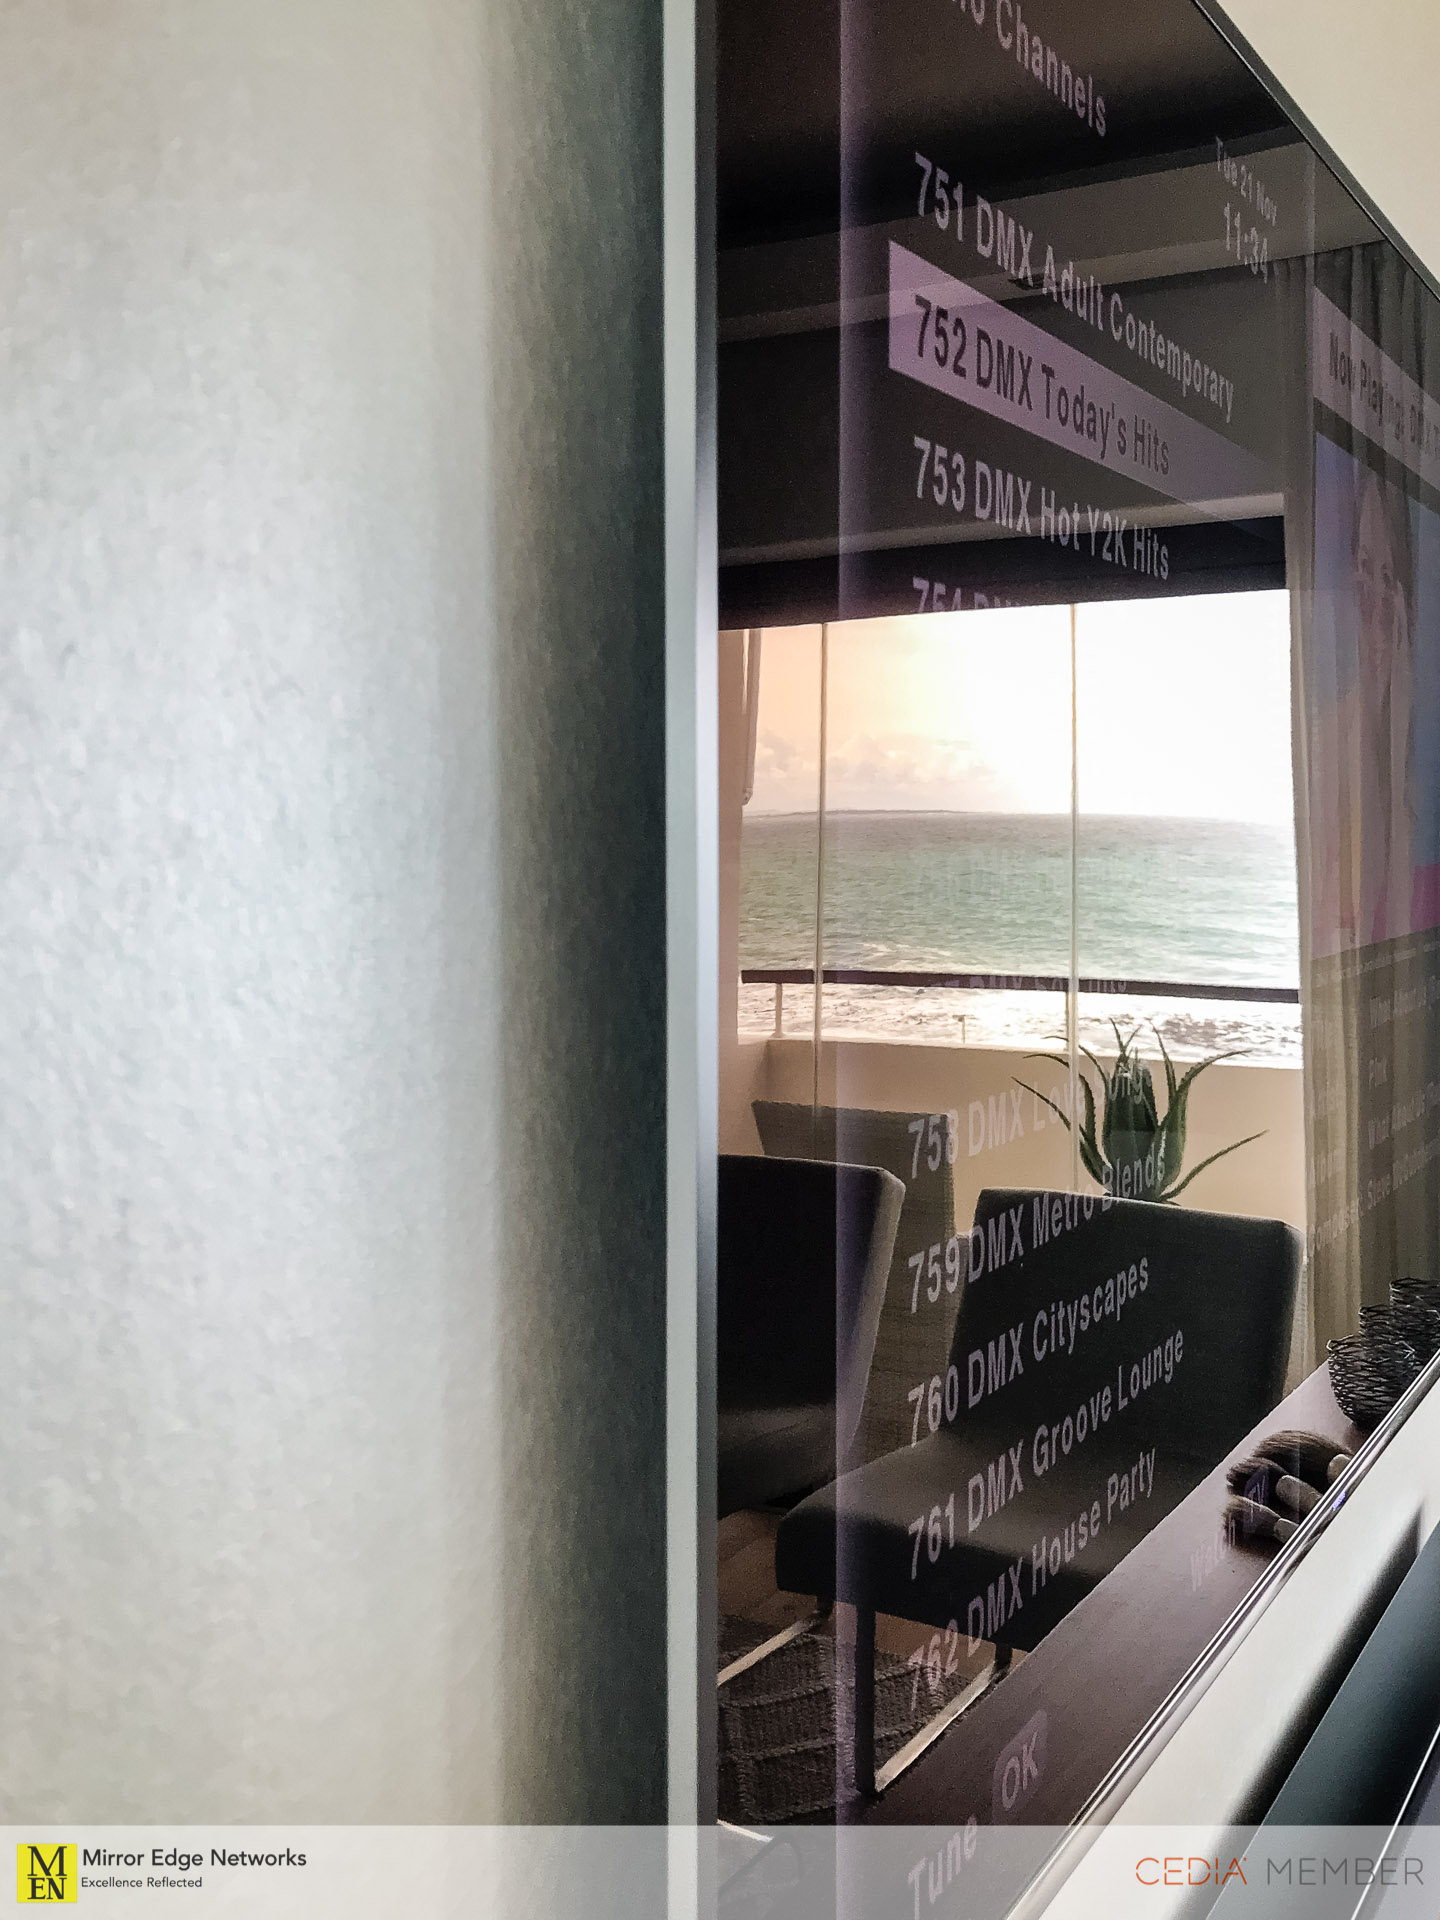 UHD Tv Installation Sea Point - Mirror Edge Networks